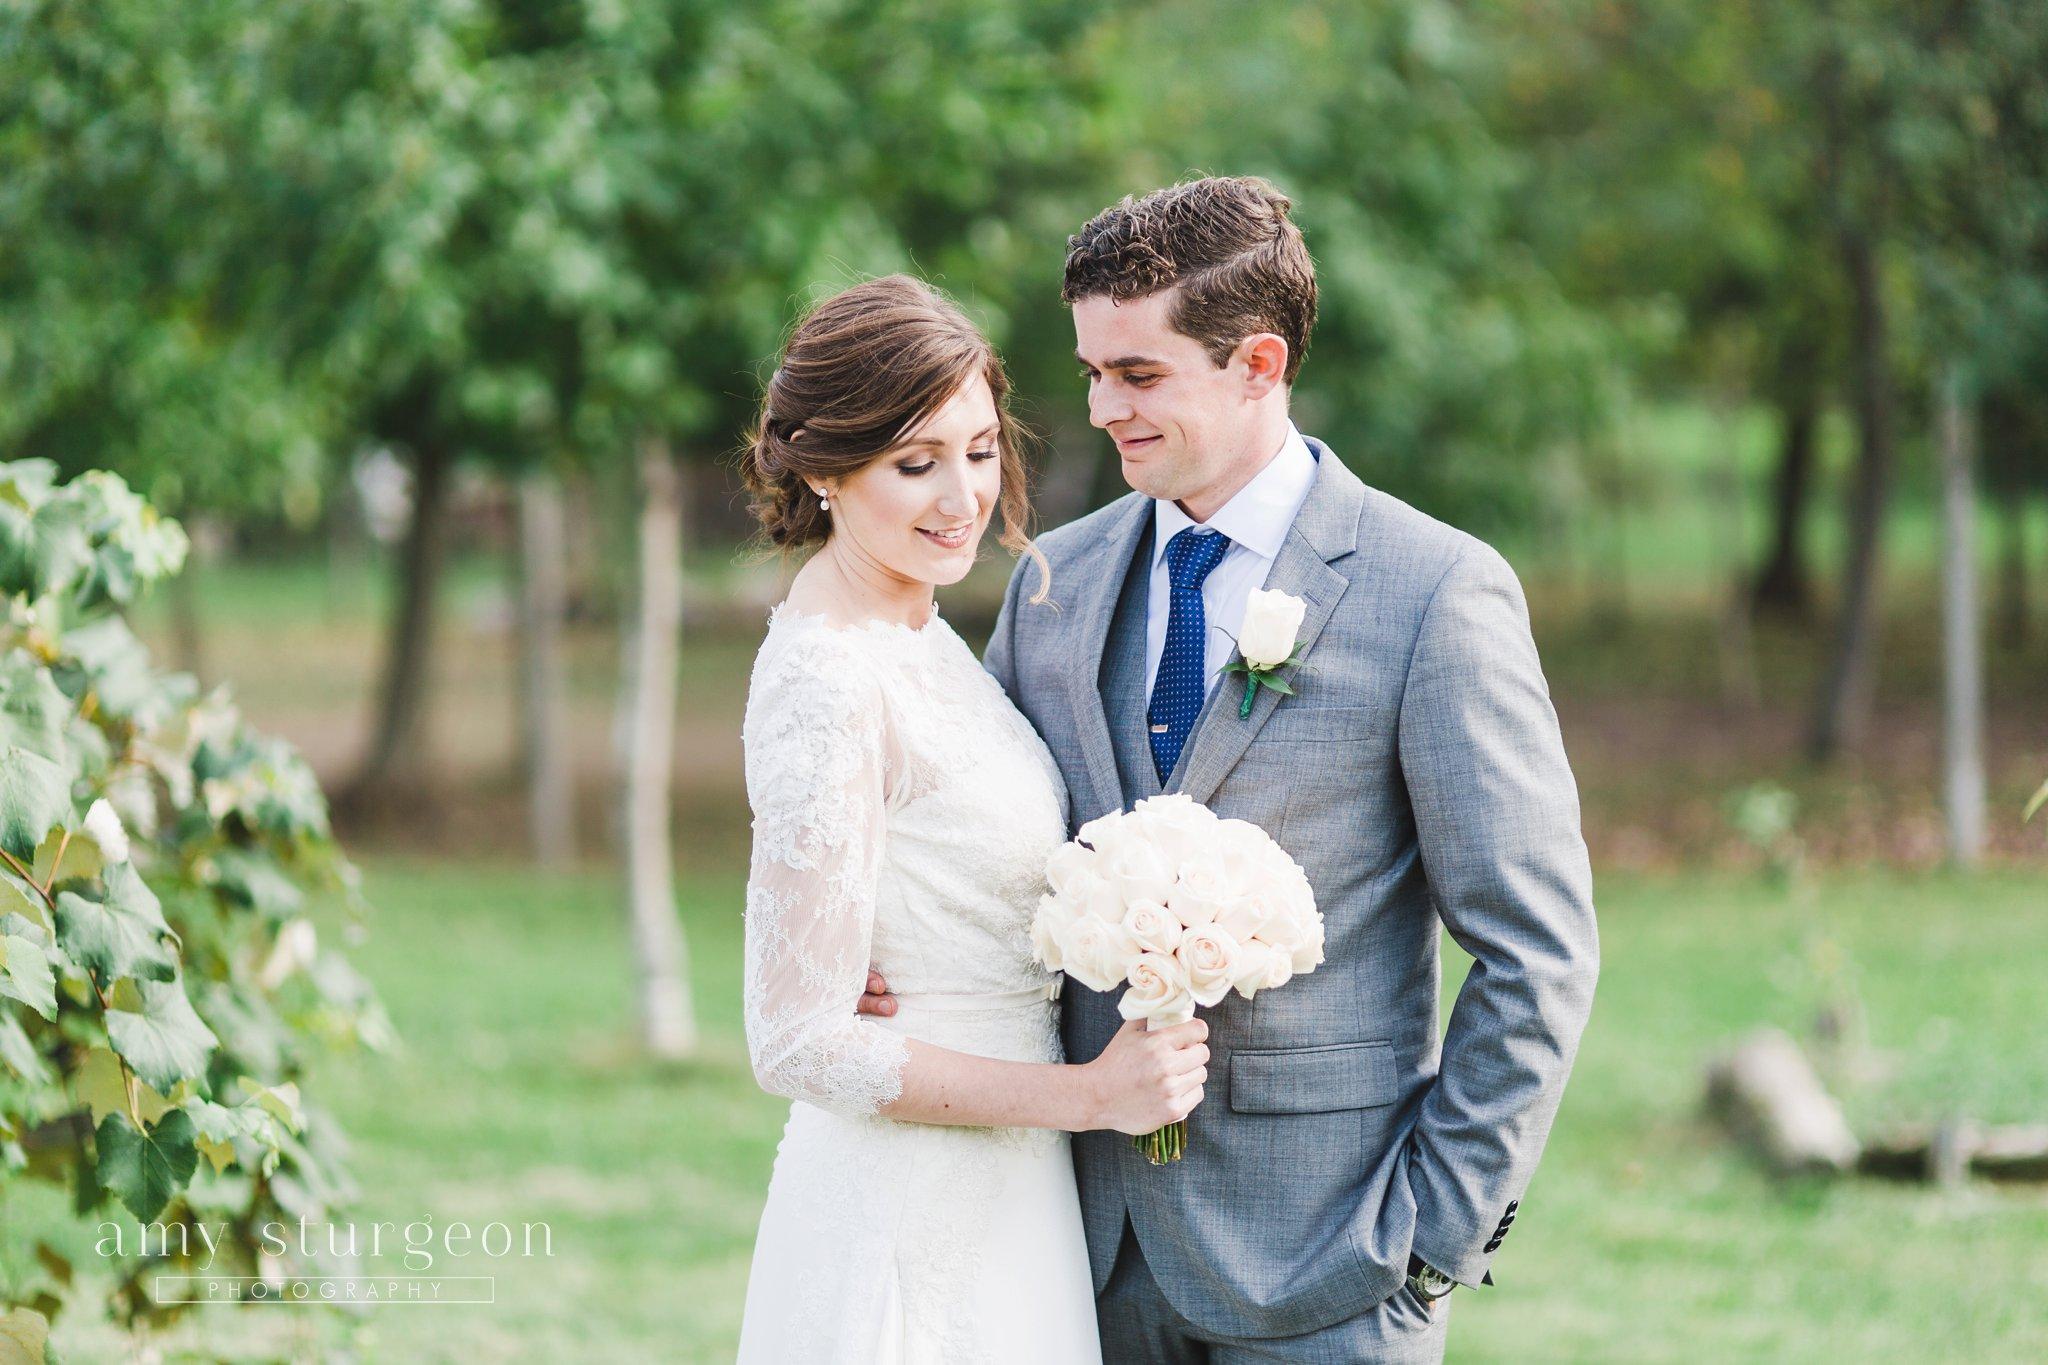 Her elegant white rose bouquet at the alpaca farm wedding